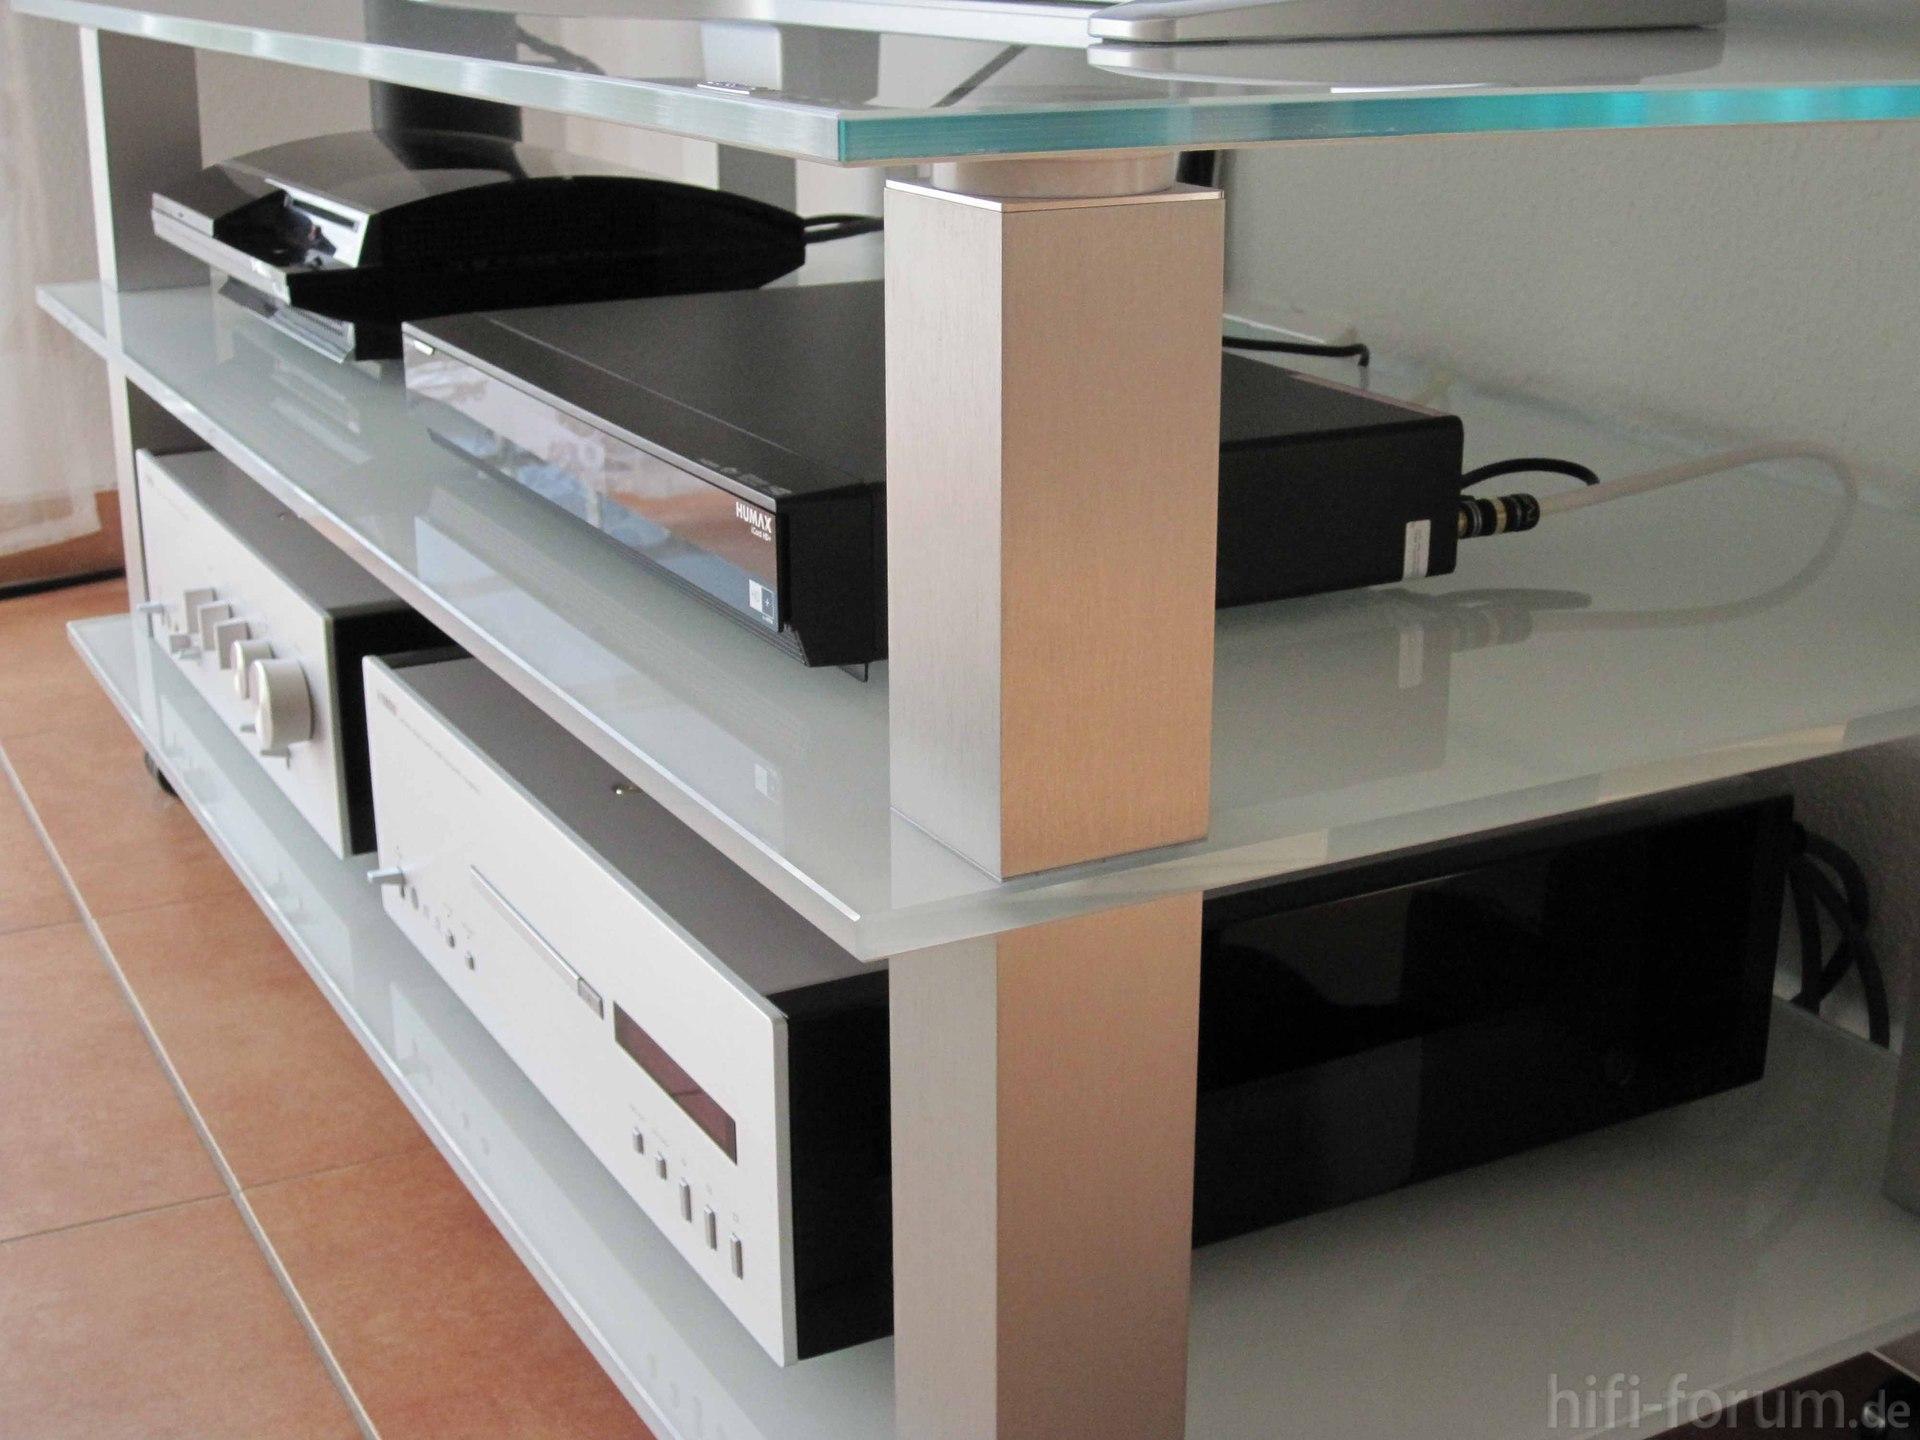 yamaha cd s2000 yamaha hifi bildergalerie. Black Bedroom Furniture Sets. Home Design Ideas